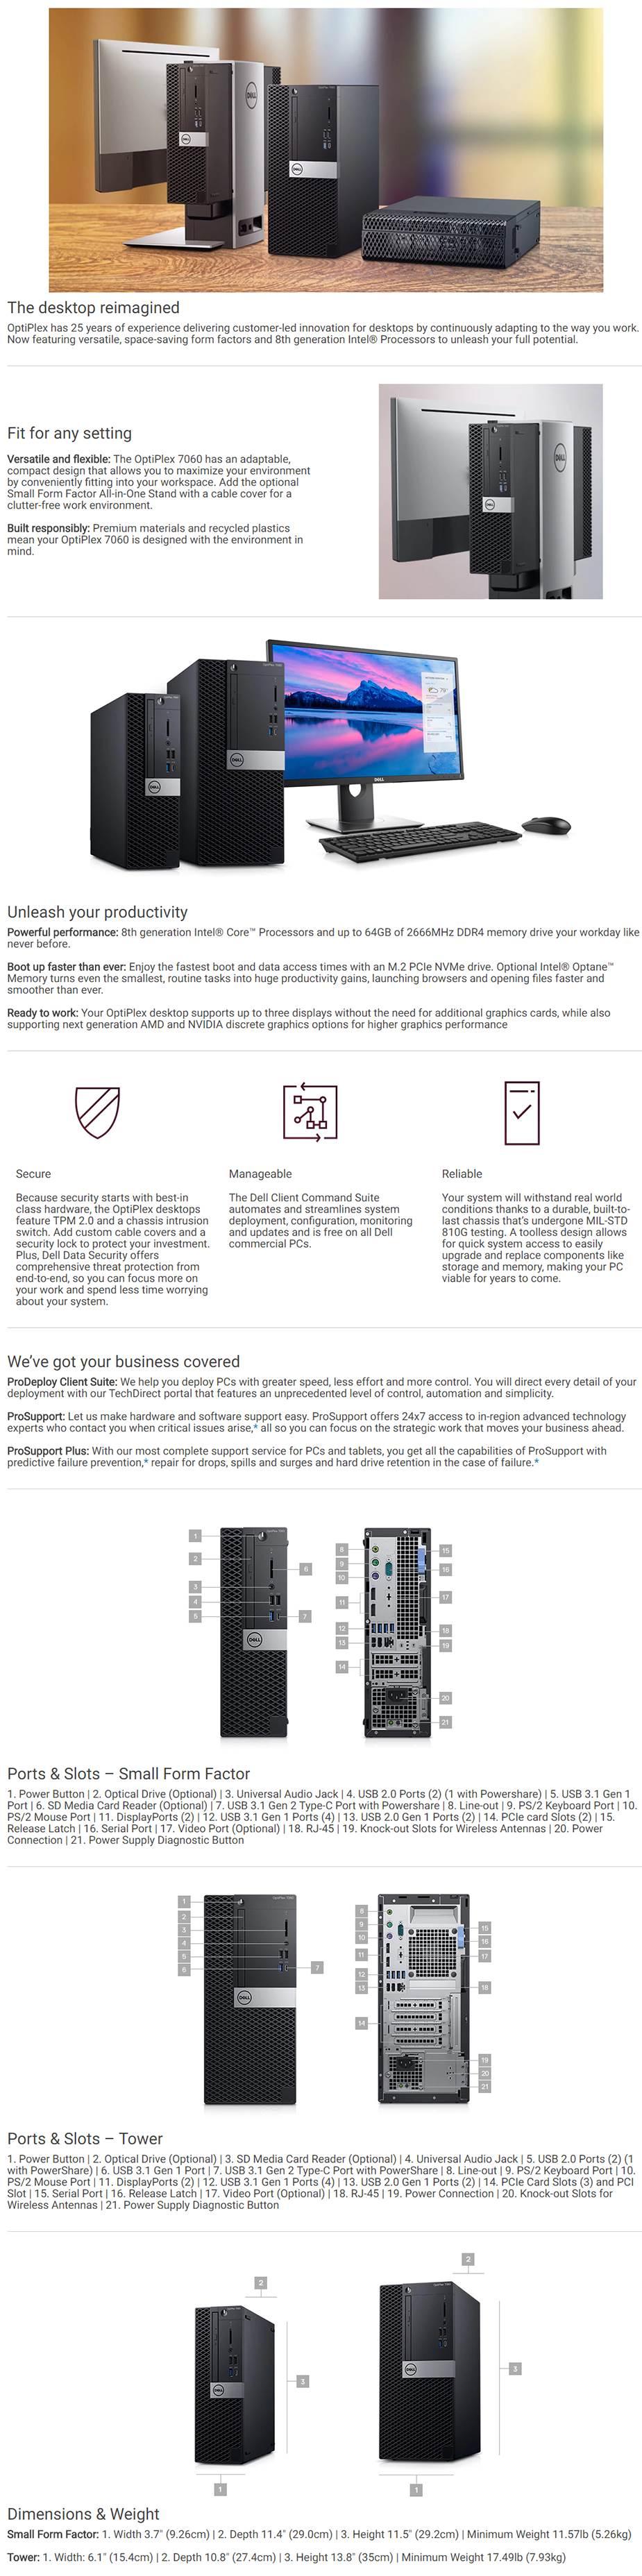 Dell OptiPlex 7060 SFF Desktop PC i7-8700 8GB 256GB SSD Win10 Pro - desktop overview